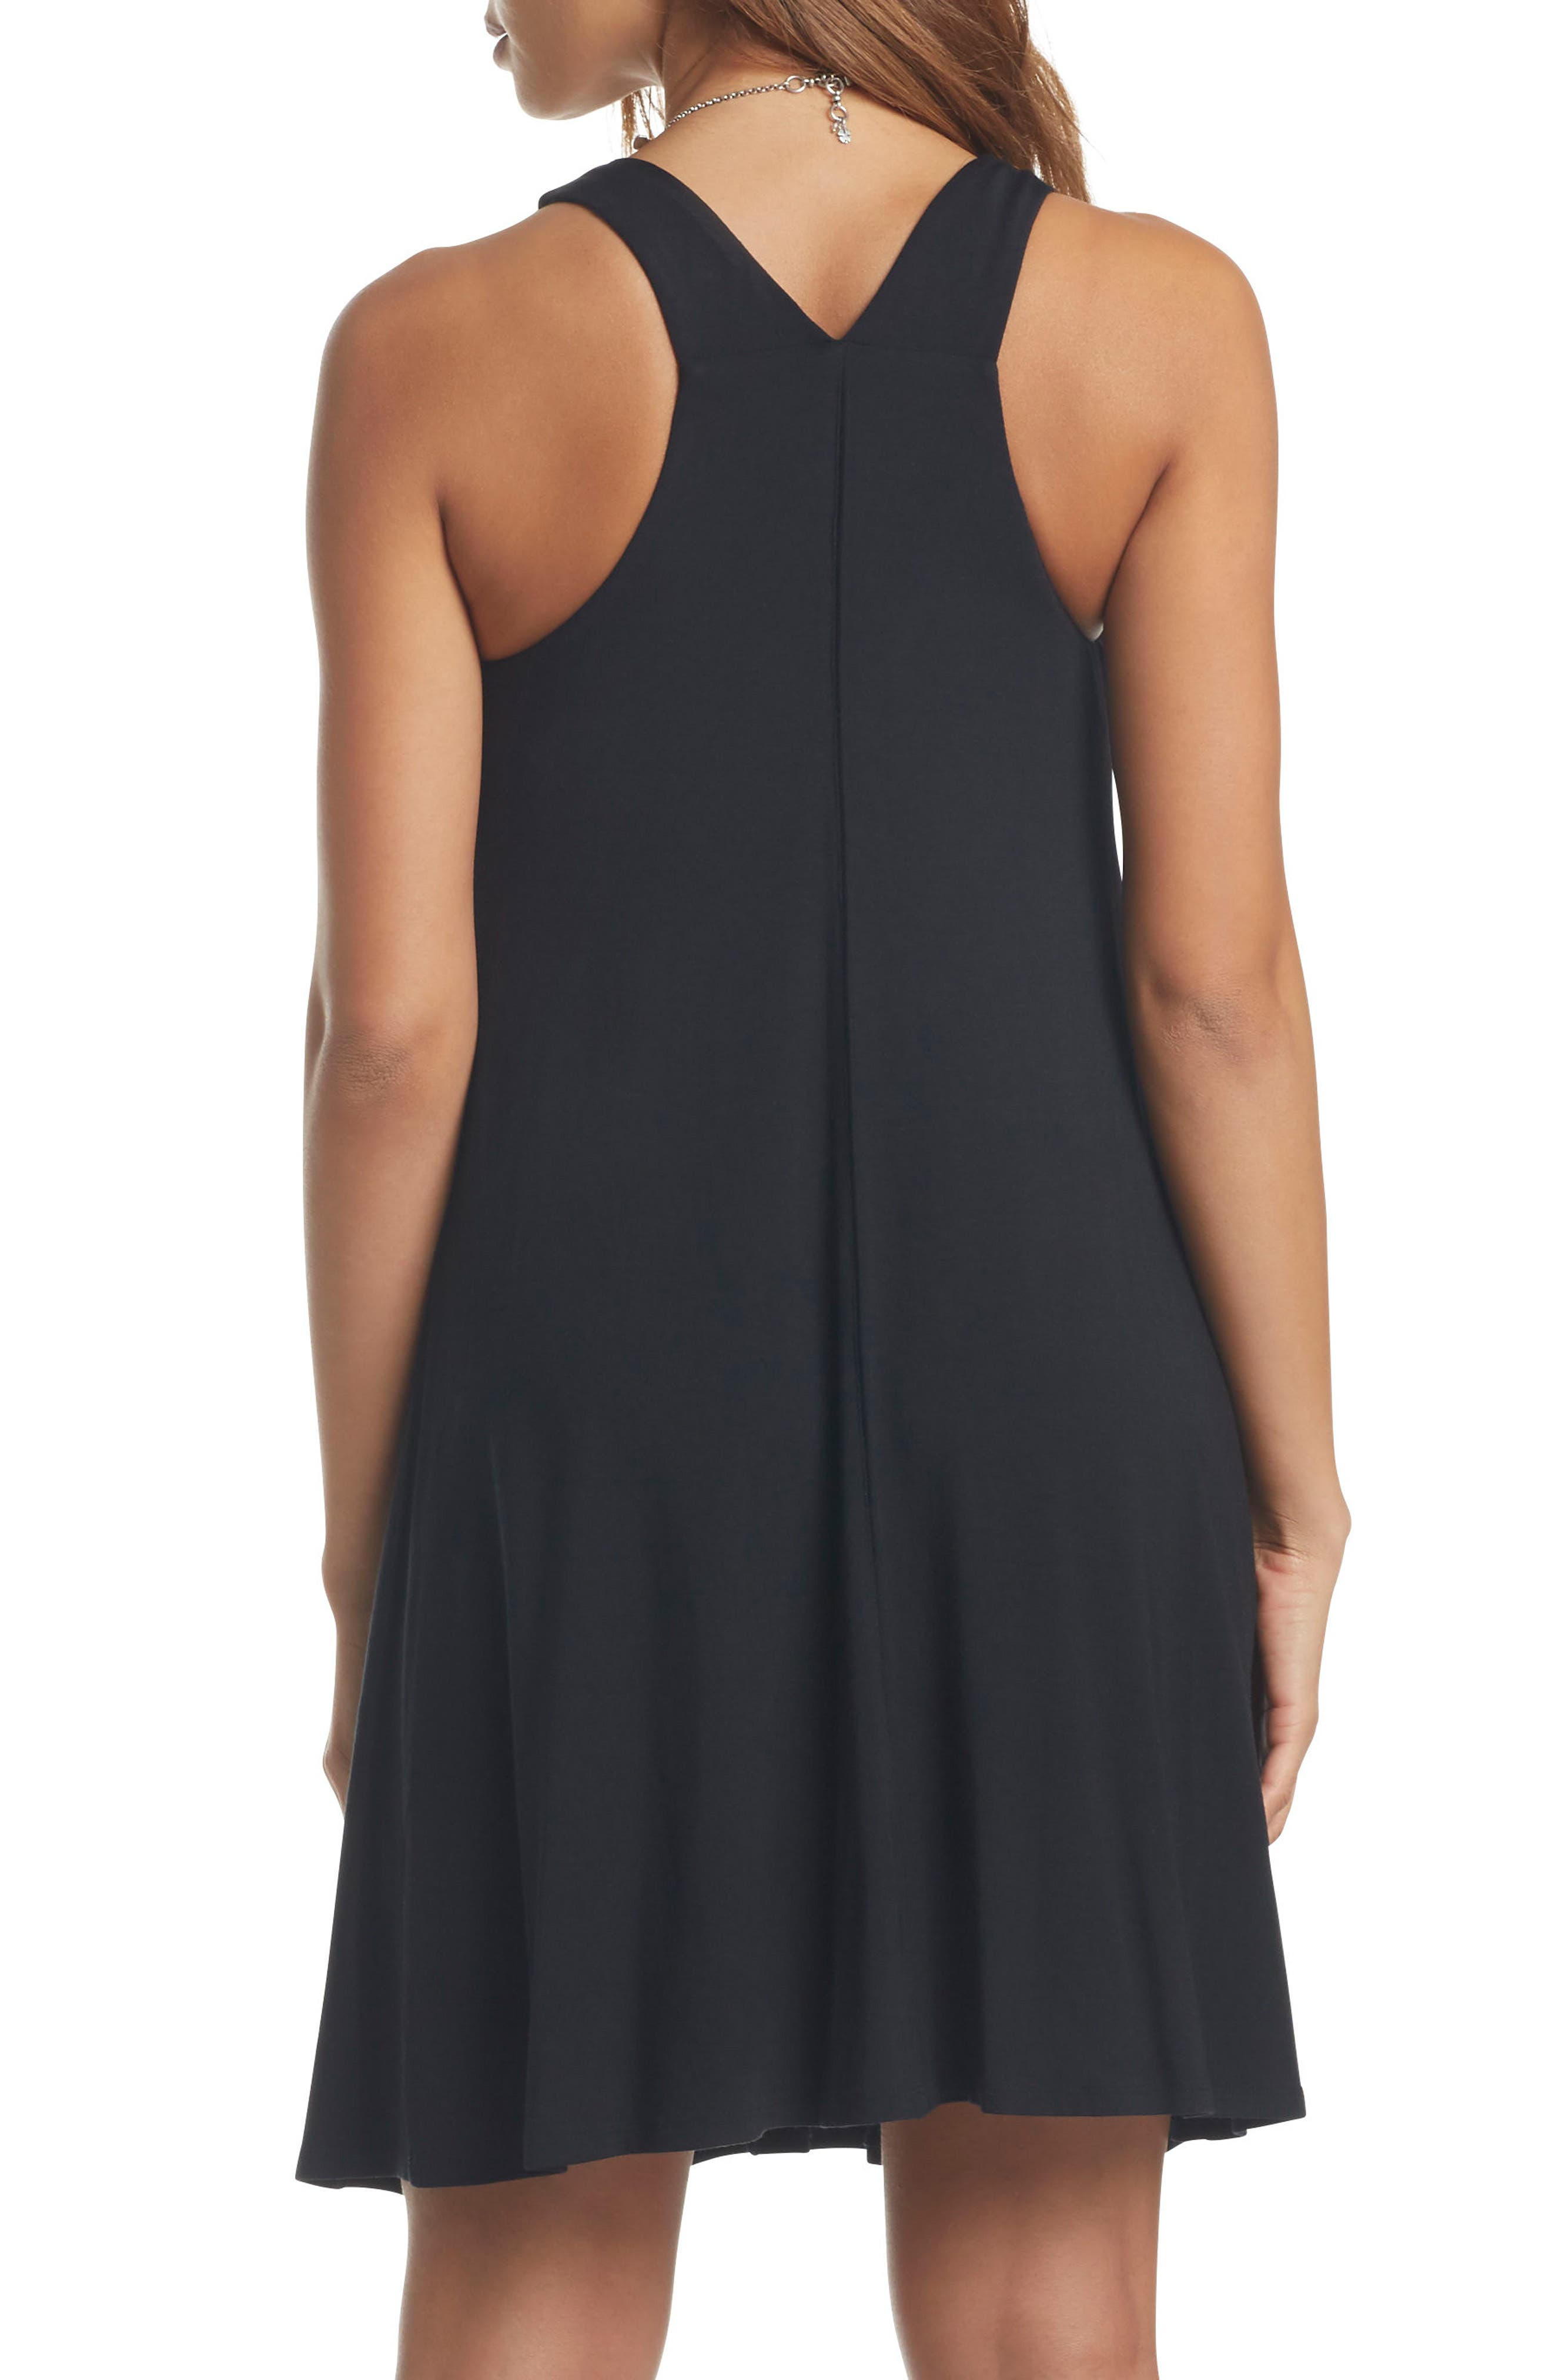 Lyndin Maternity Dress,                             Alternate thumbnail 2, color,                             BLACK